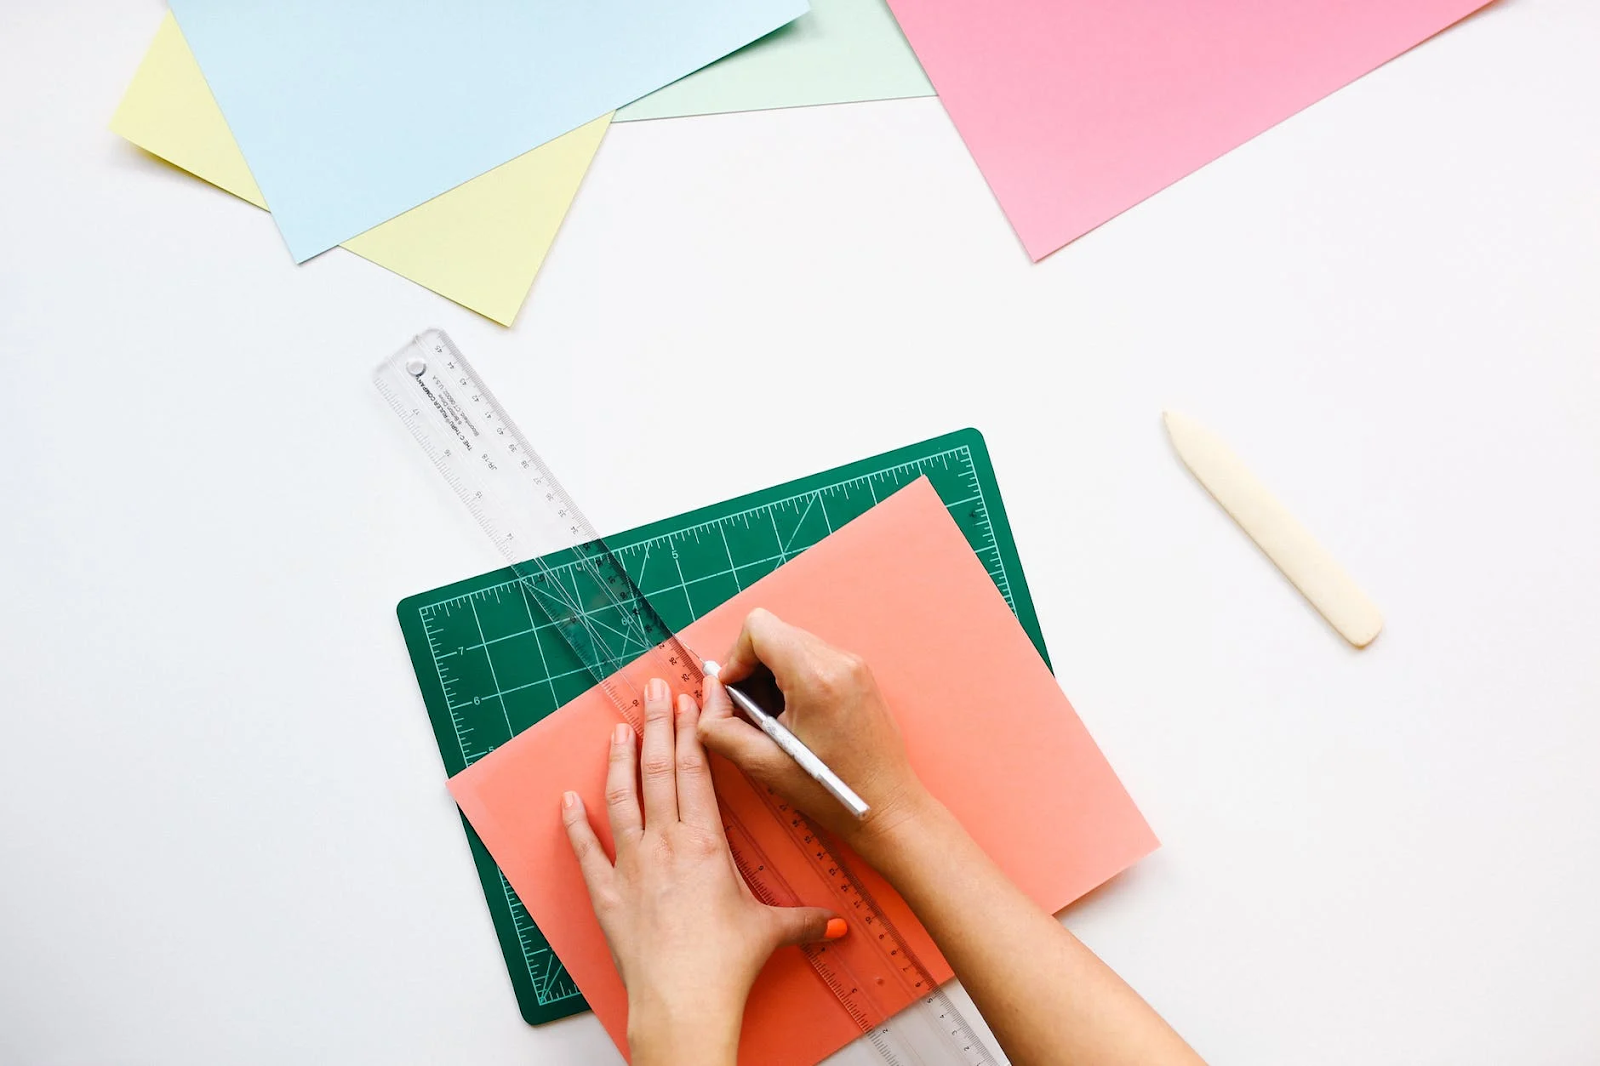 graphic design scholarships